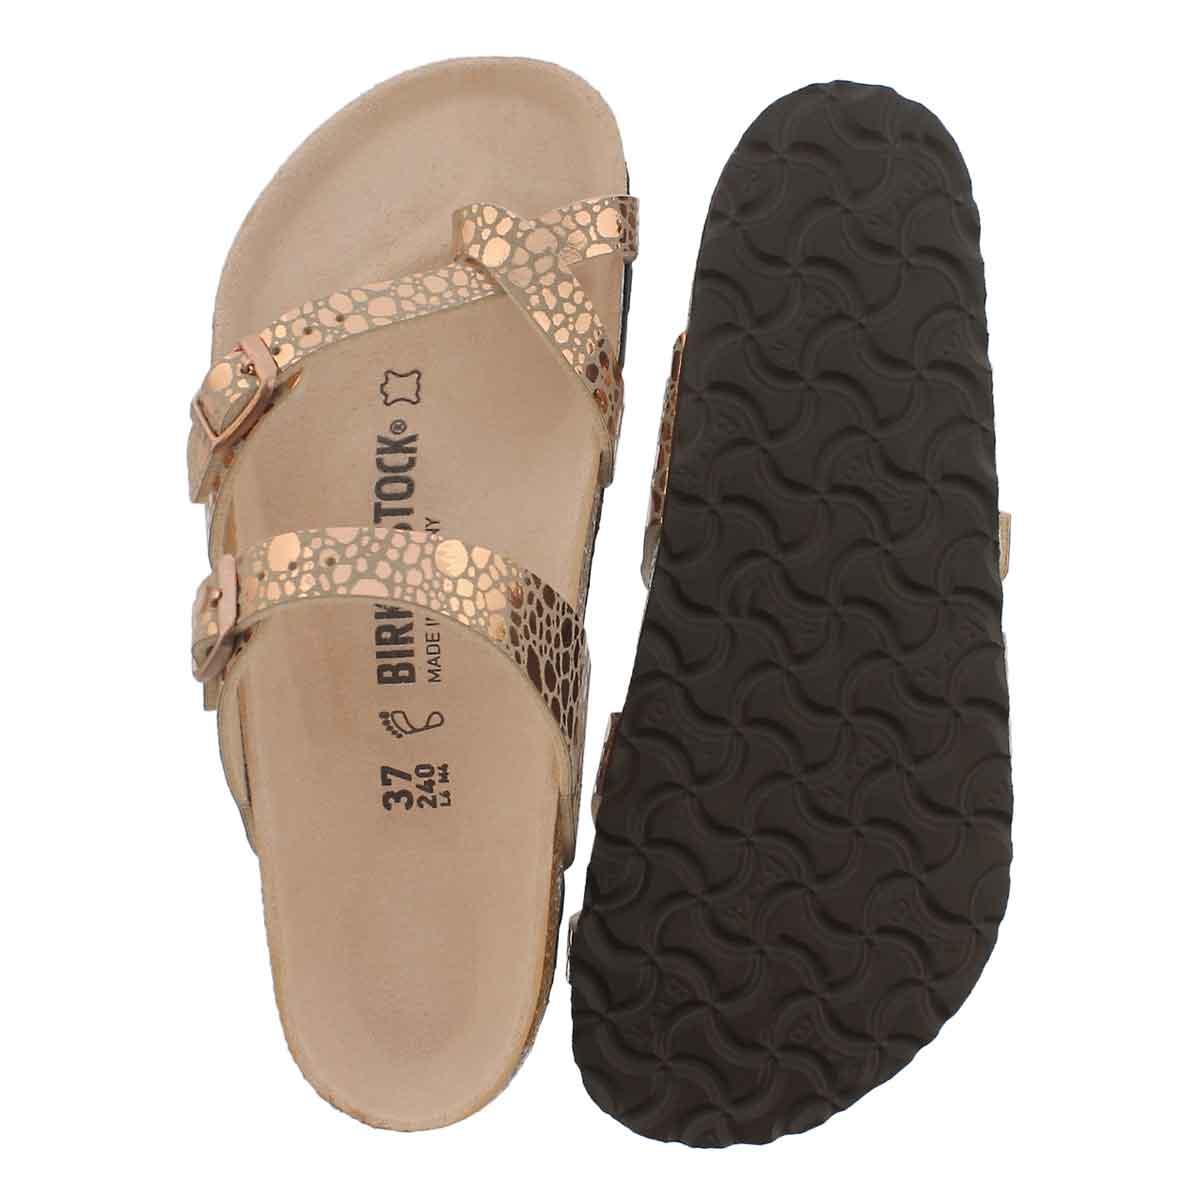 Lds Mayari BF mtlc stone cppr toe sleeve